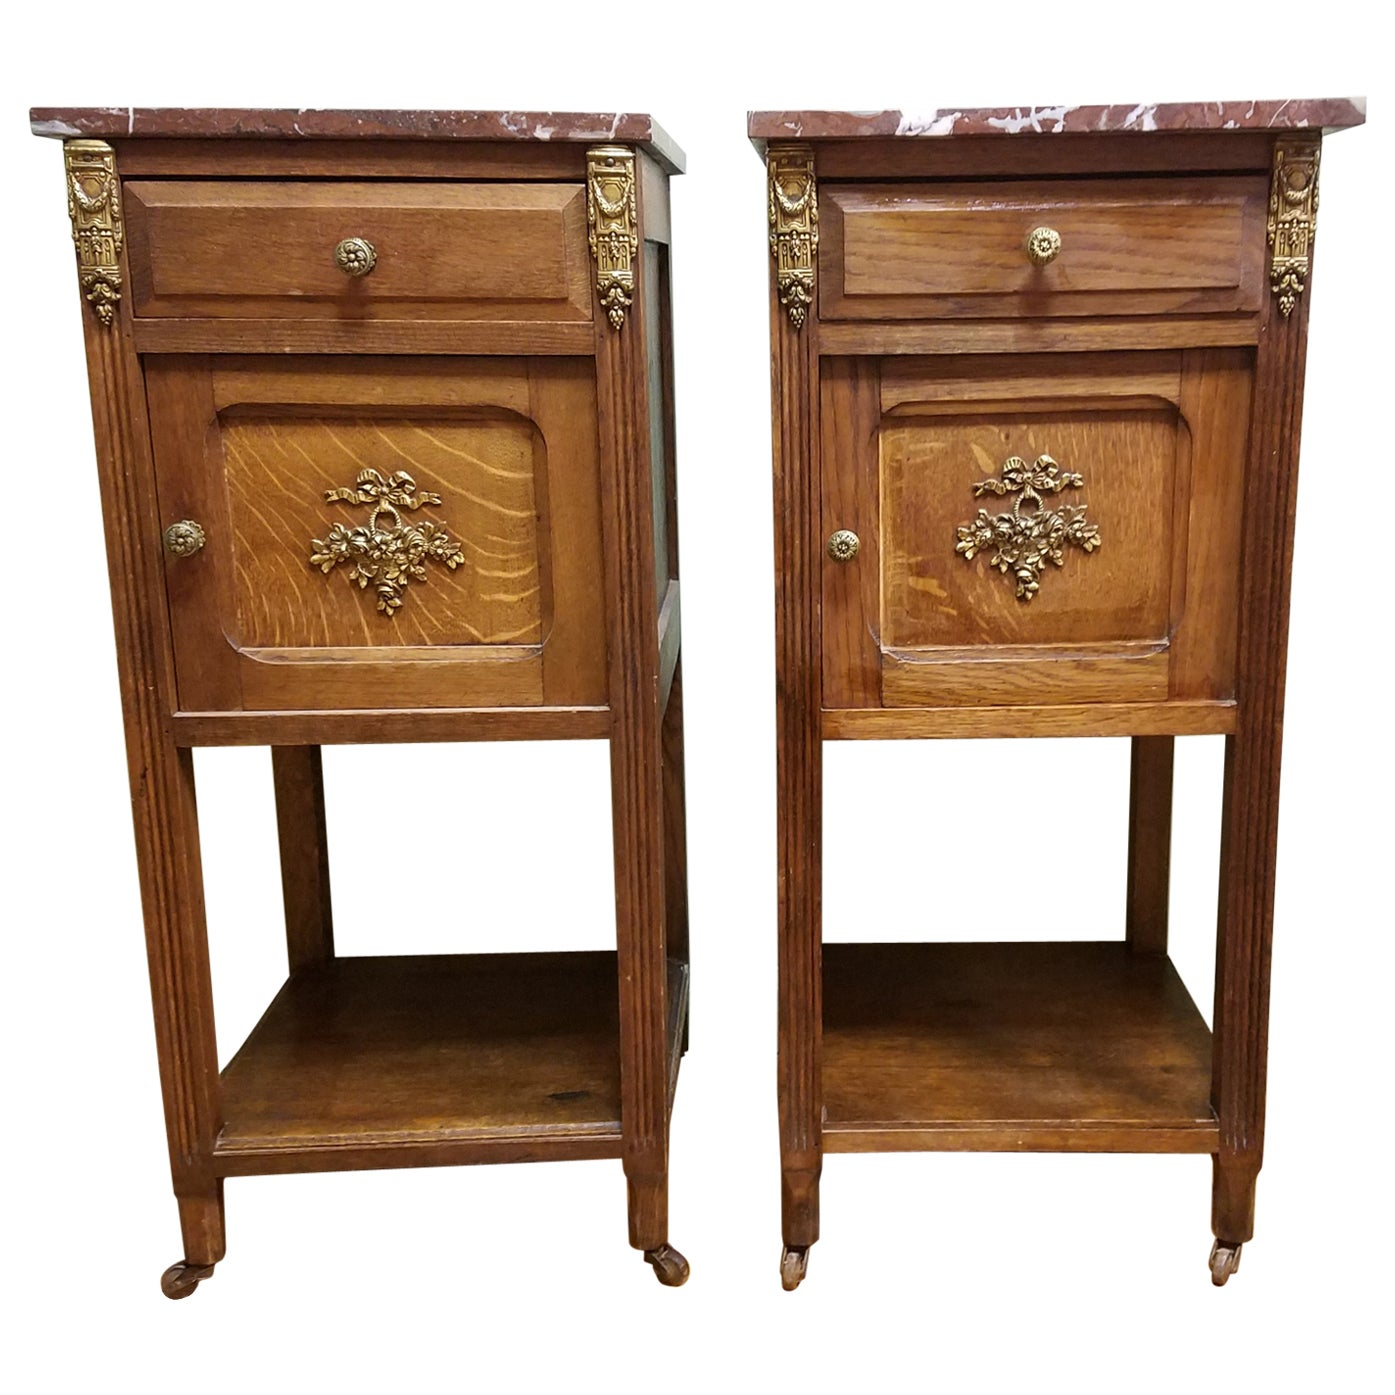 Pair of Vintage Marble-Top End Tables